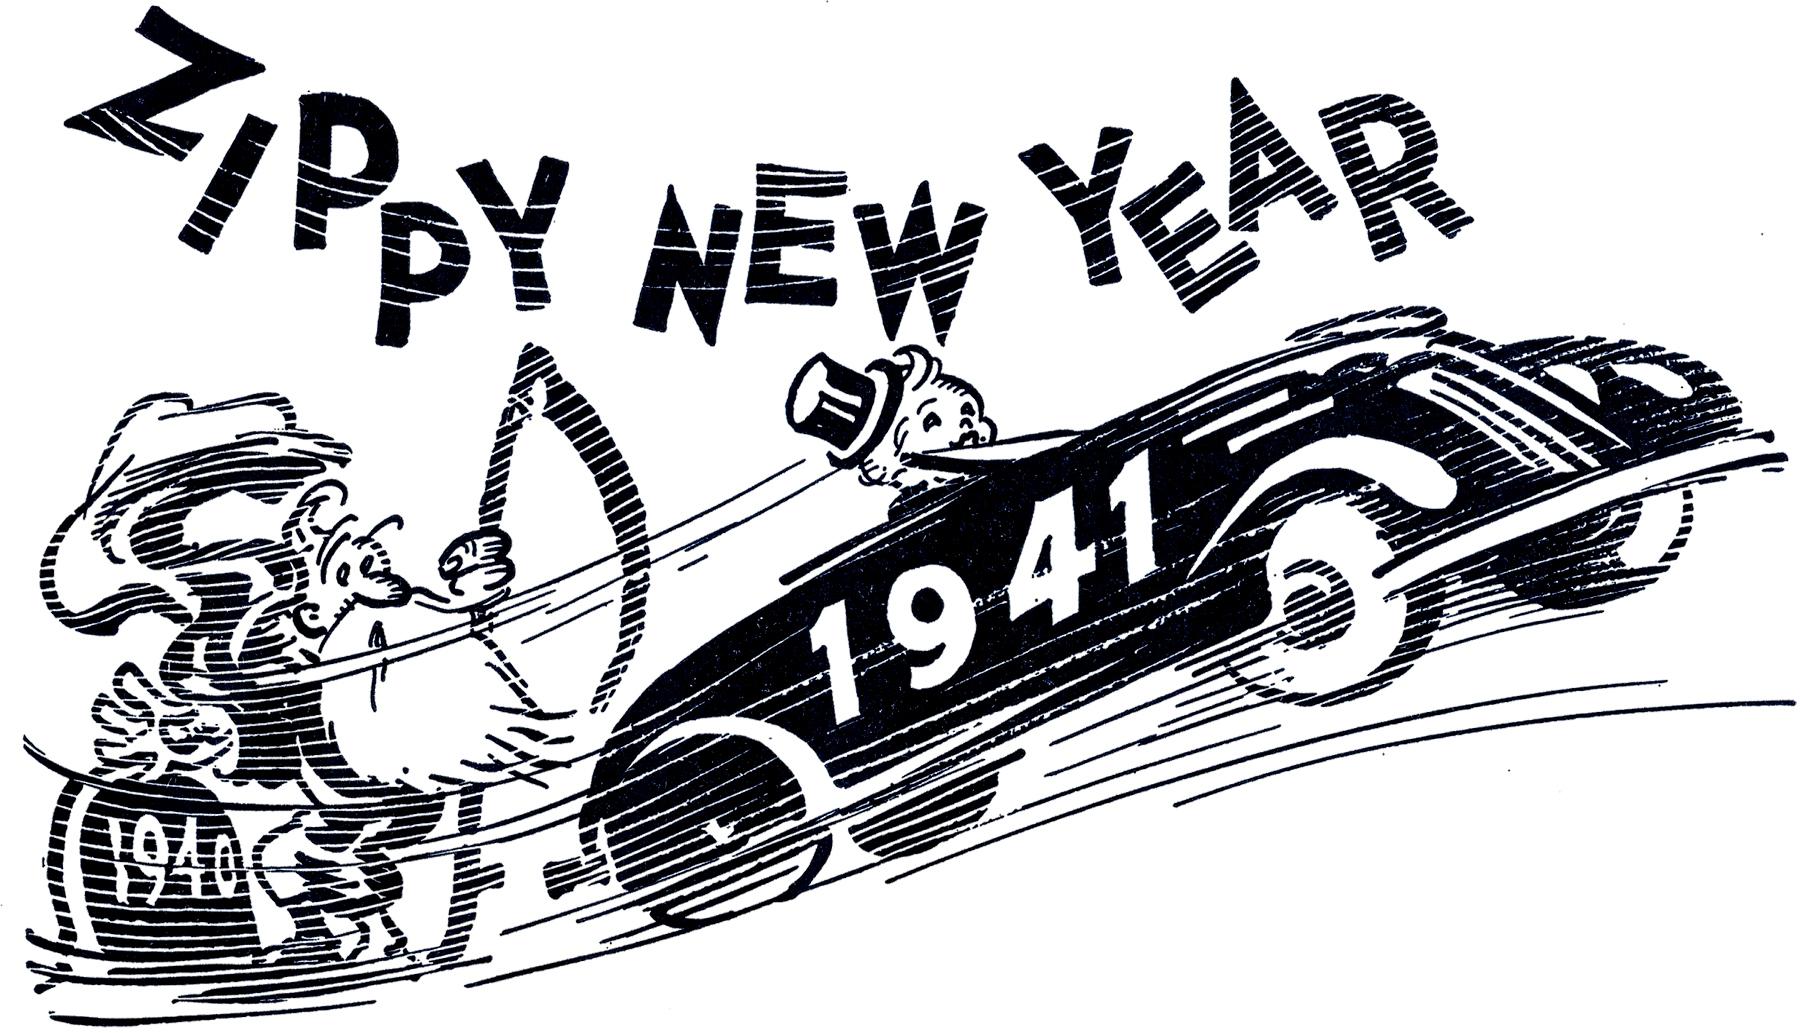 Retro New Year Image